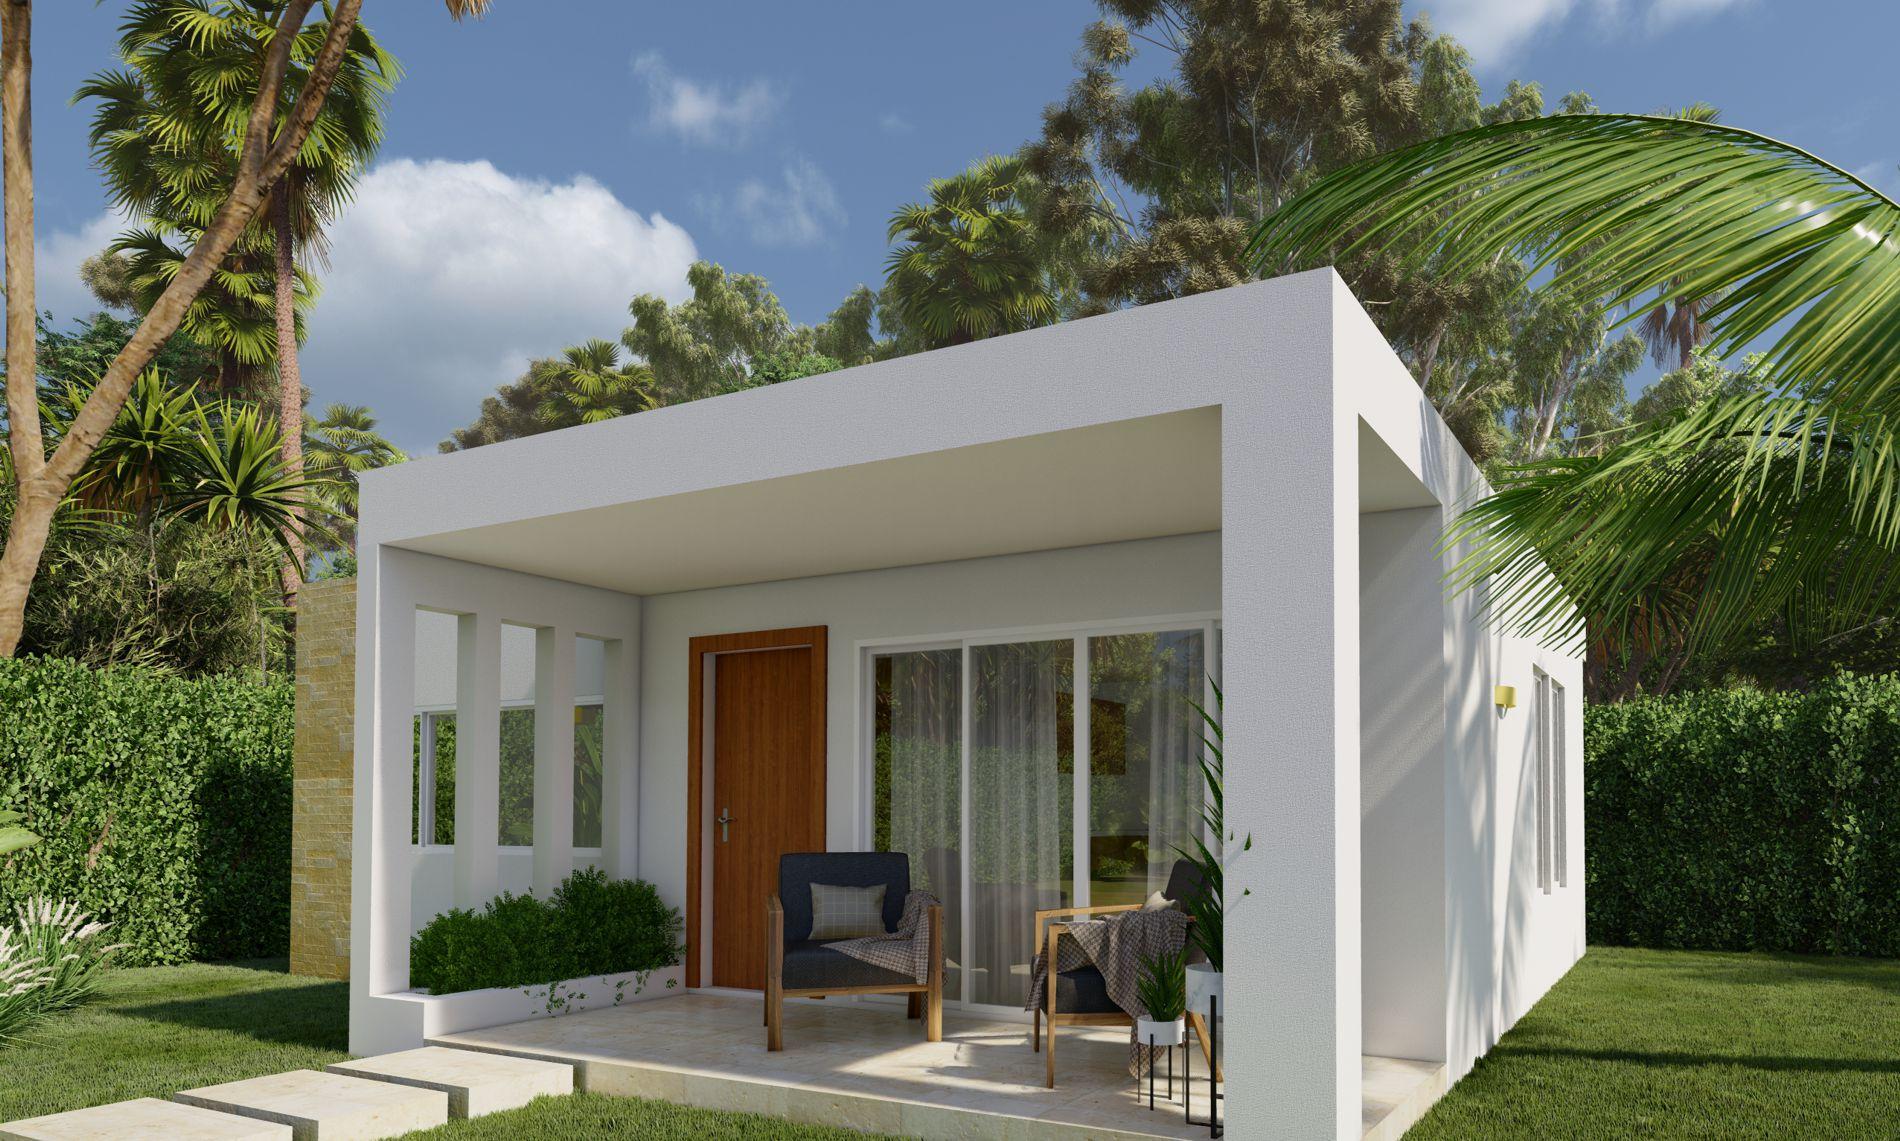 Guest House Casa Linda Villas